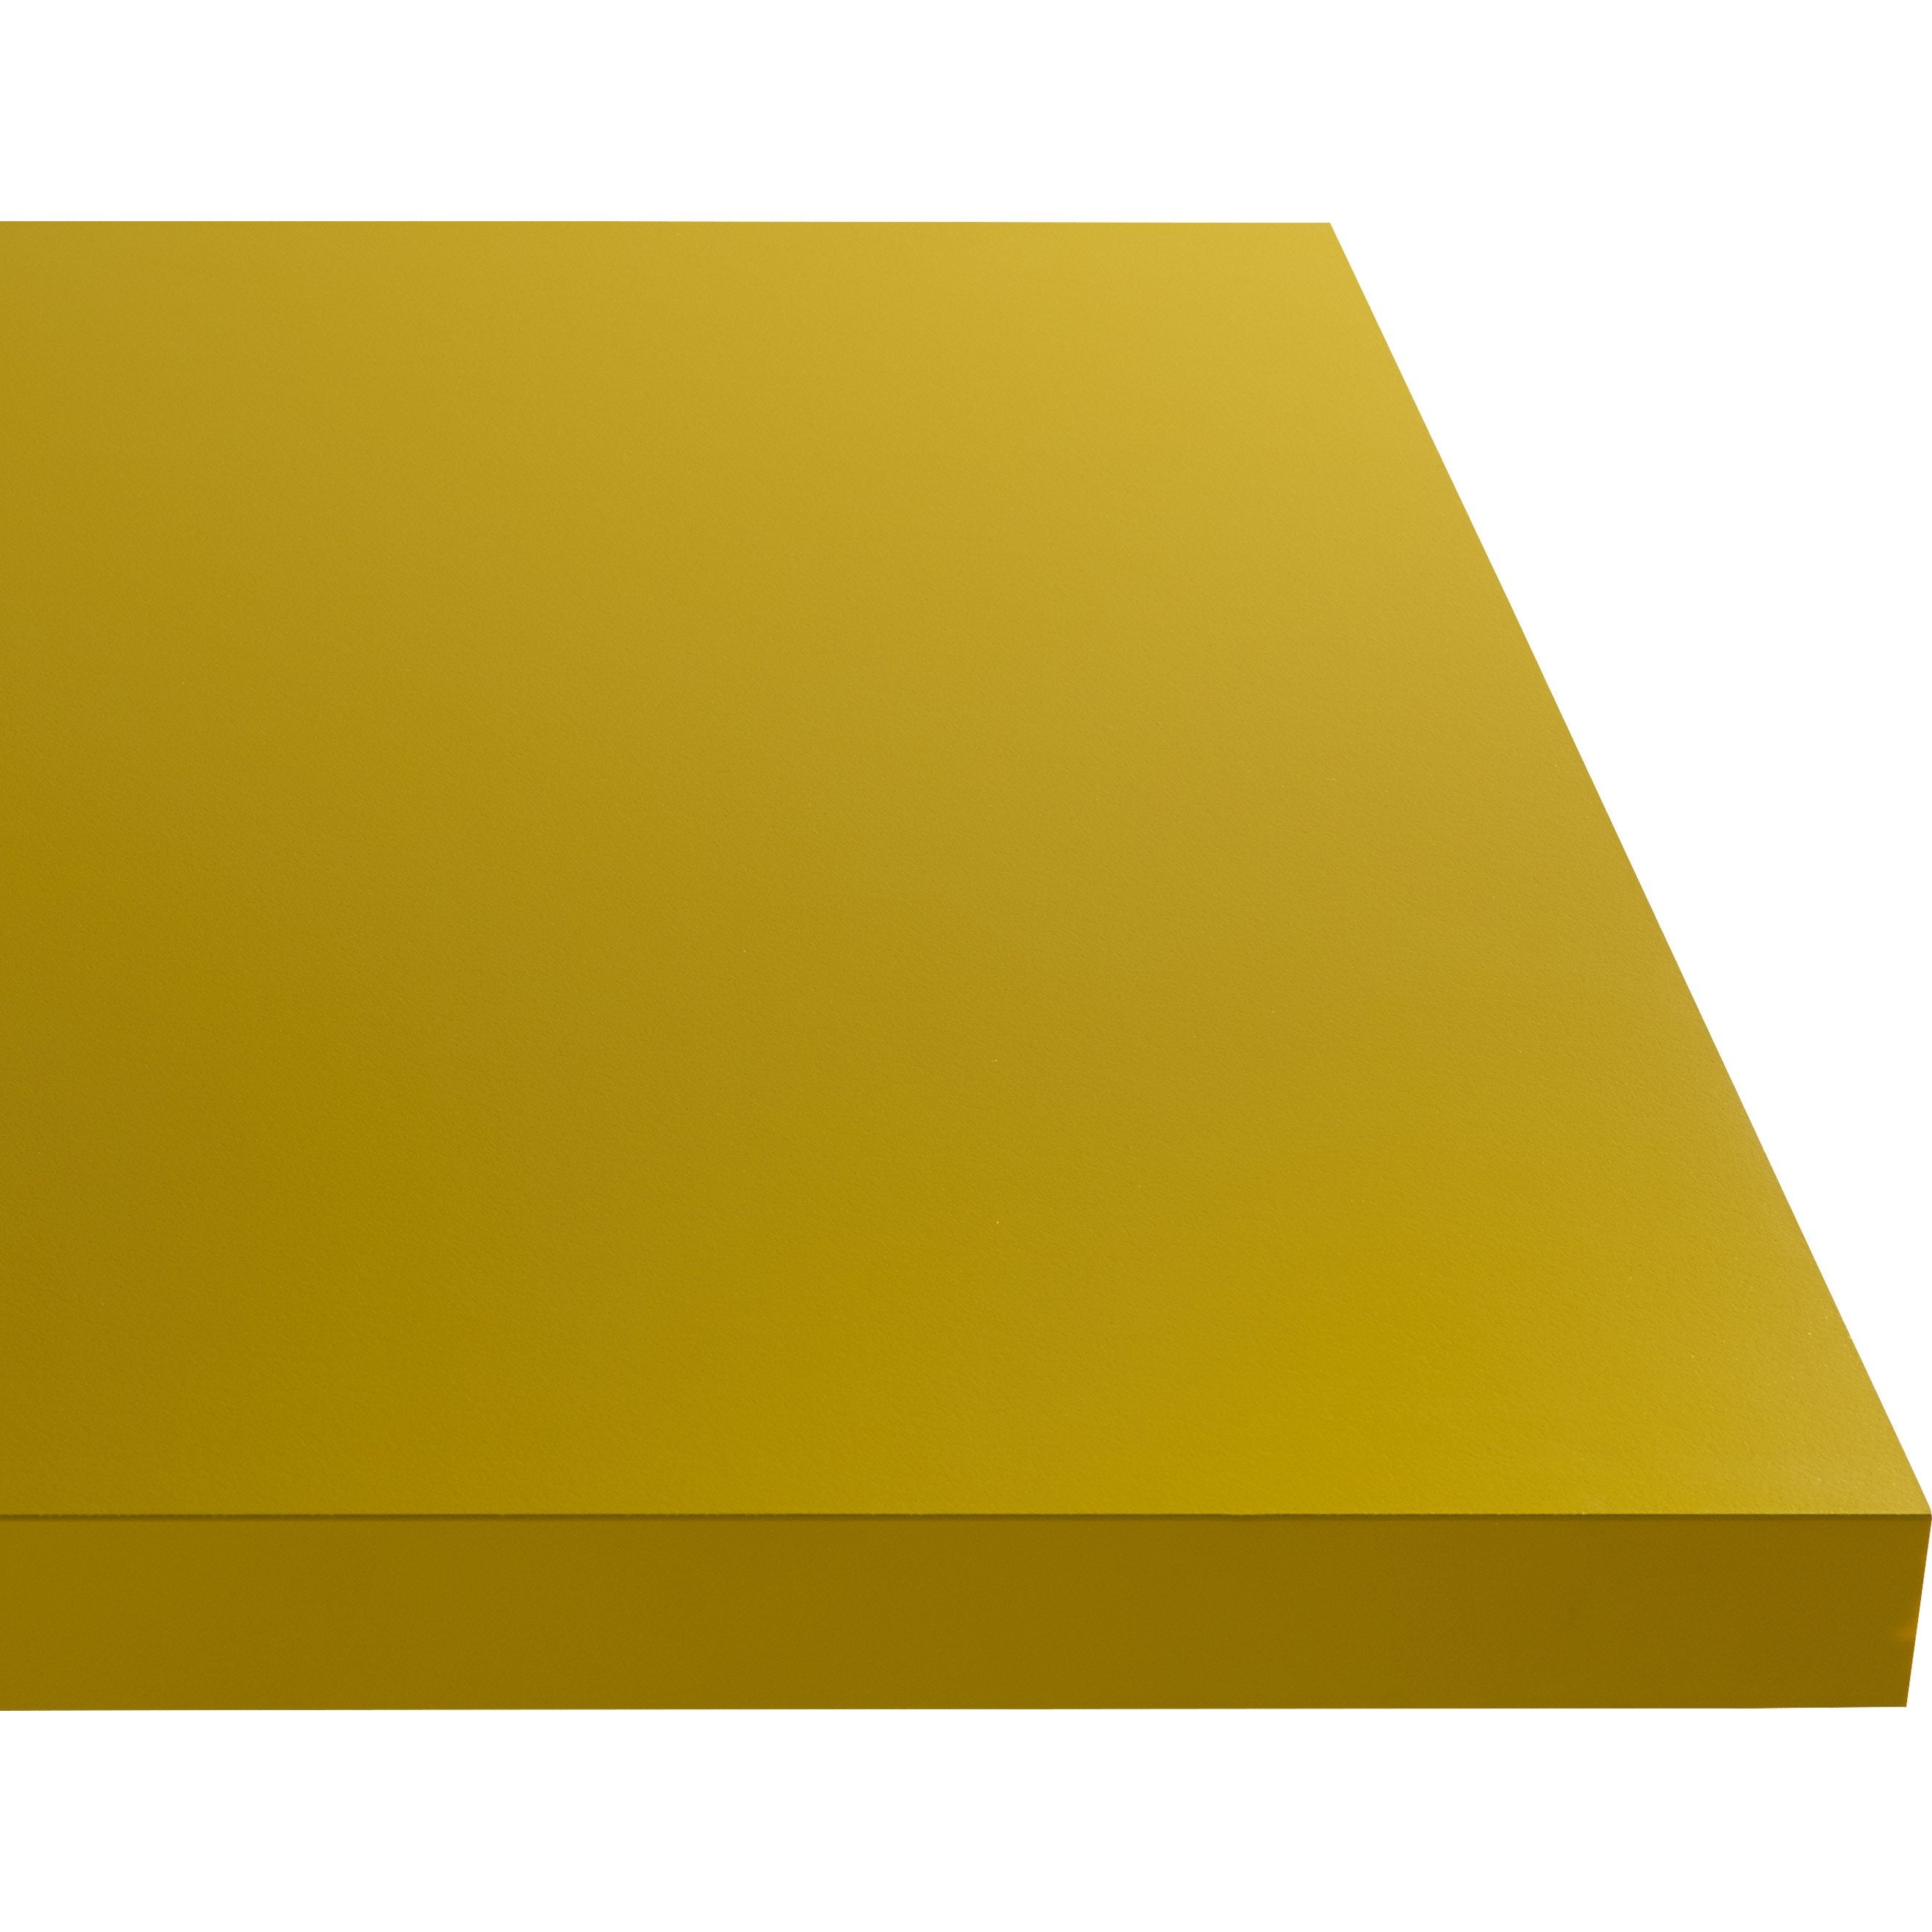 Plan de travail stratifié Jaune serin Mat L.300 x P.65 cm, Ep.38 mm